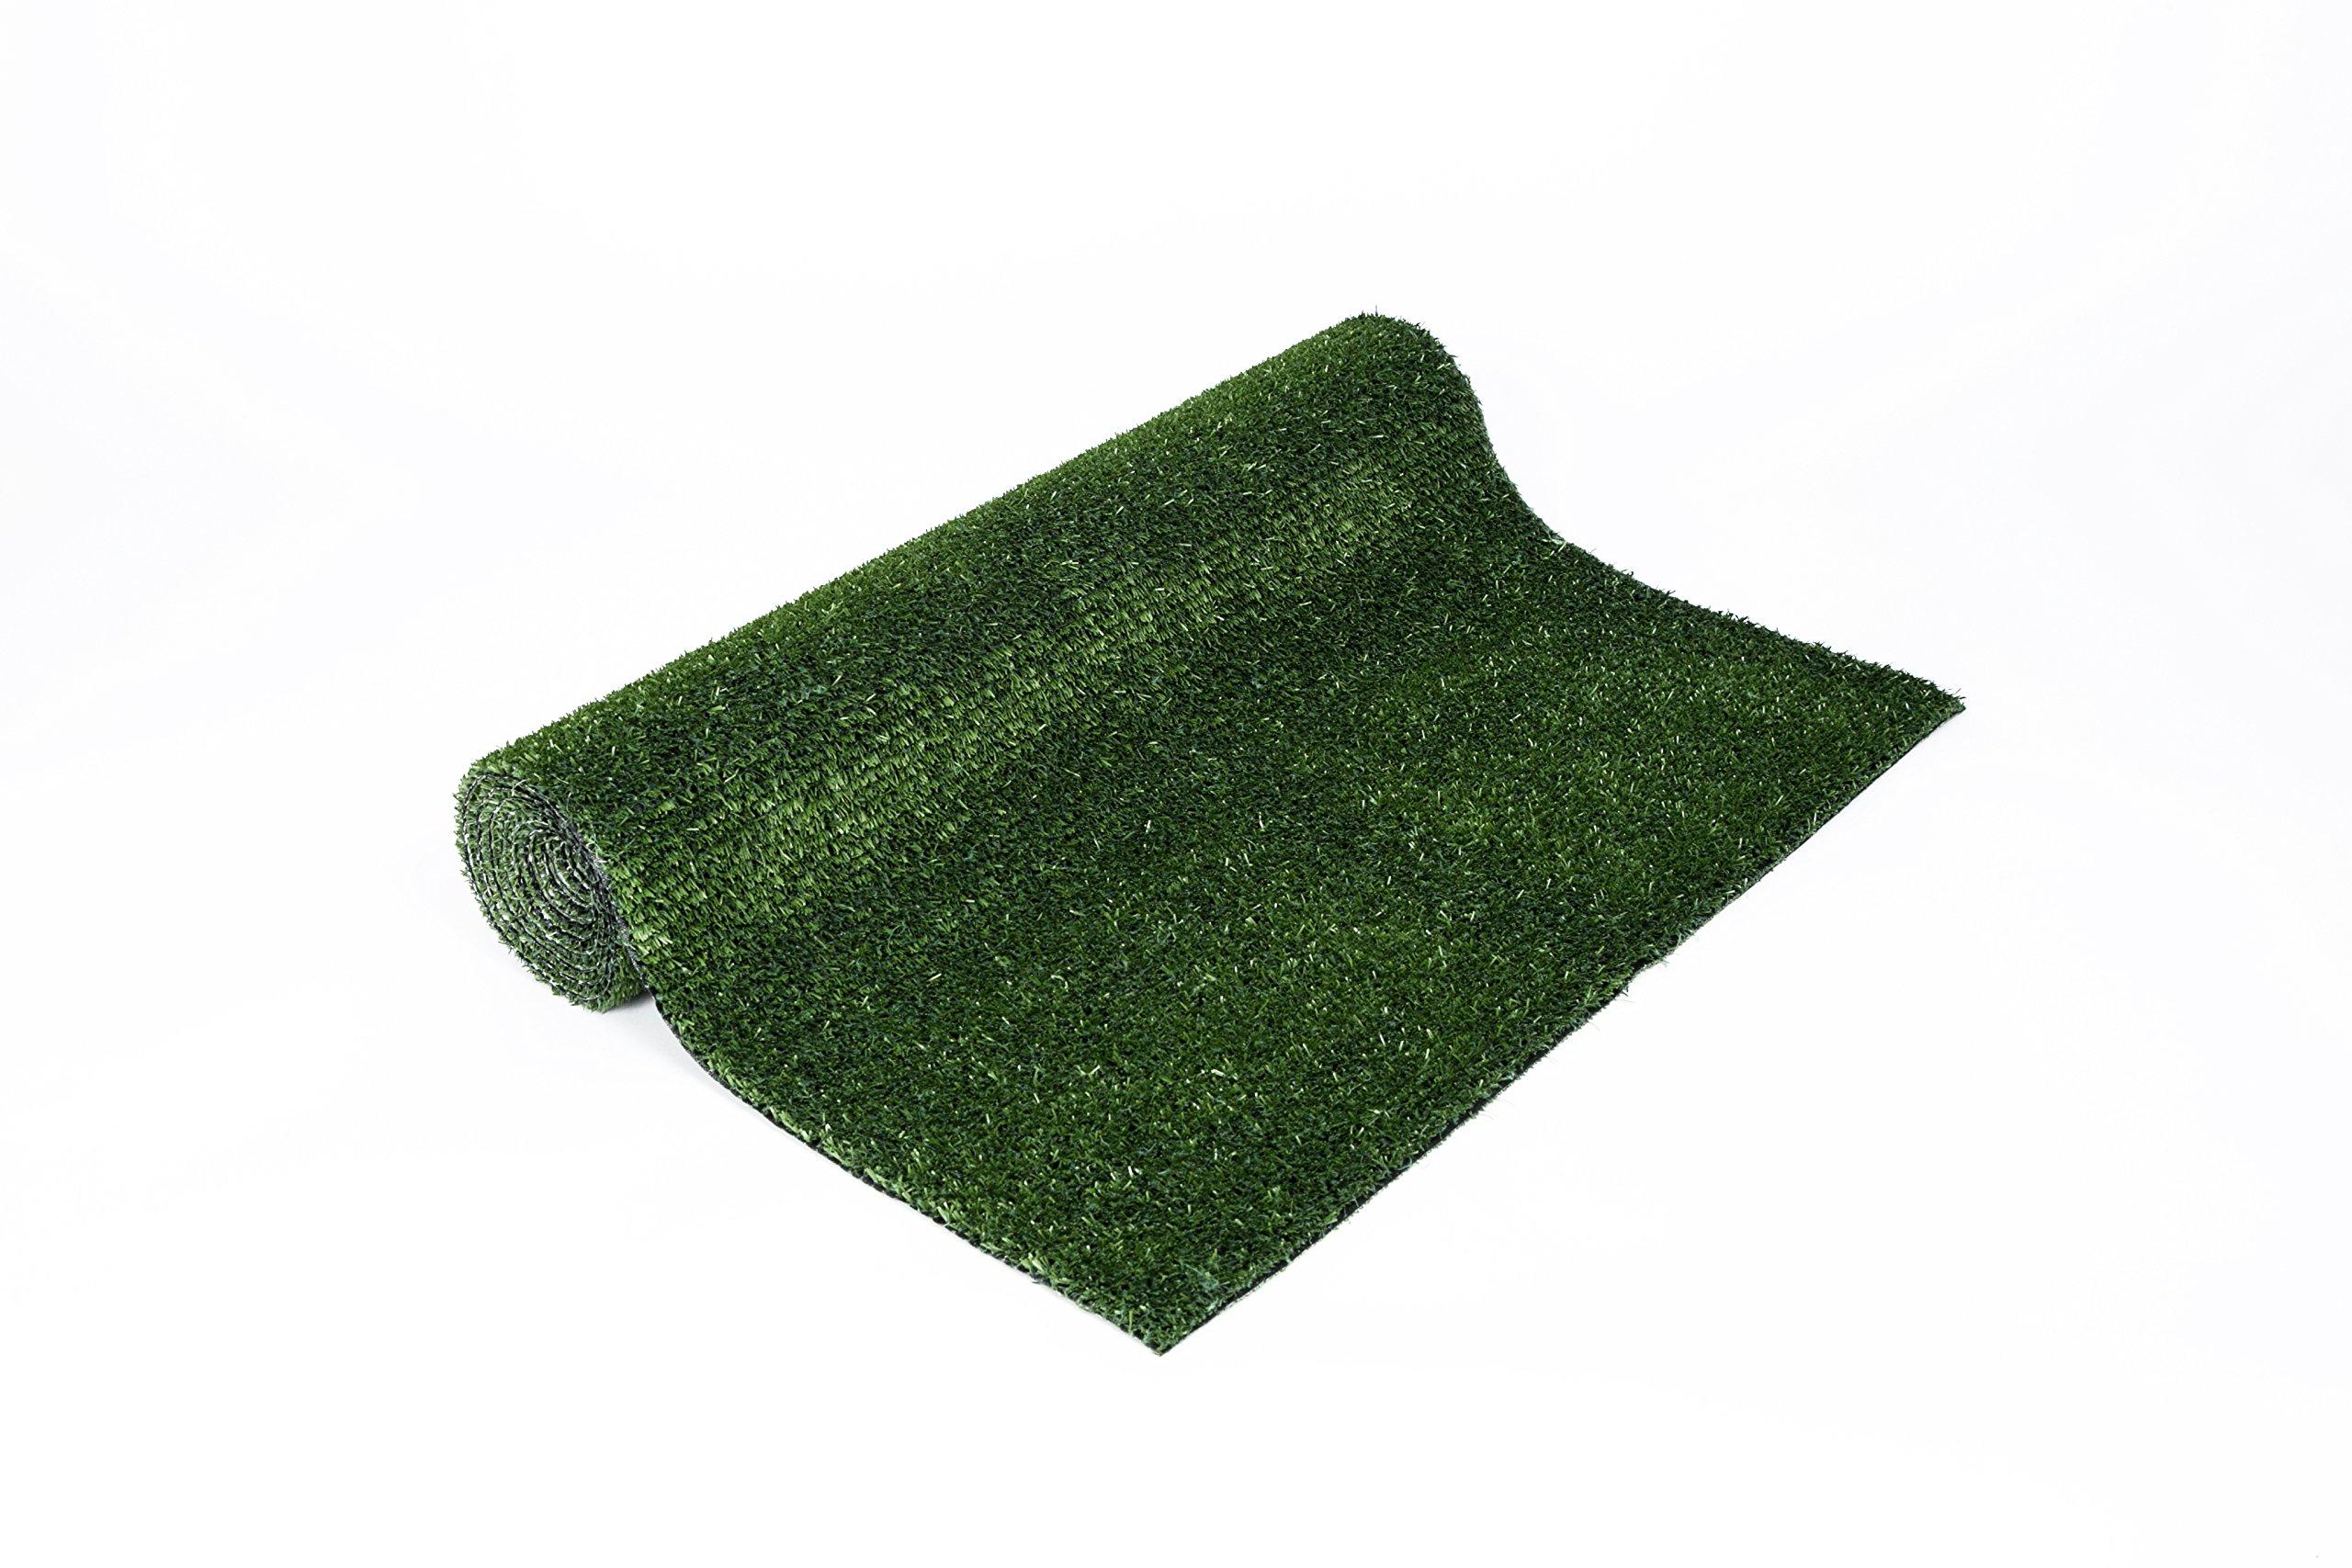 PoochPads PT3X10 Indoor Turf Dog Potty Grass Roll, Medium/36'' x 120''